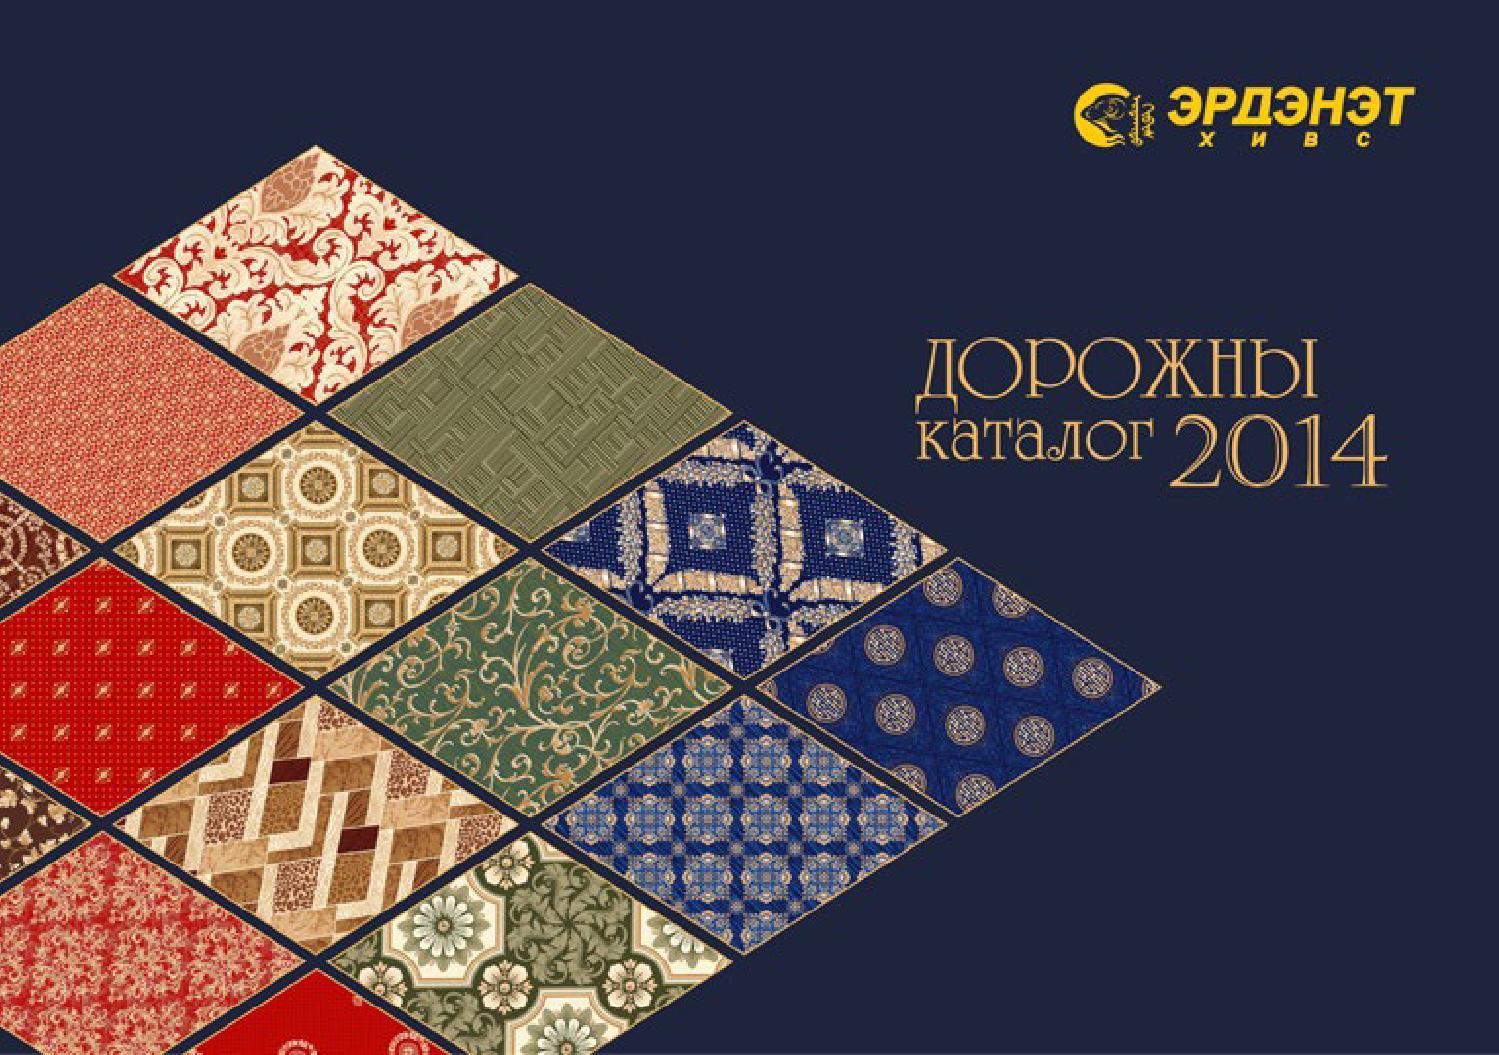 erdenet carpet rug catalogue 2014 by erdenetcarpet issuu. Black Bedroom Furniture Sets. Home Design Ideas